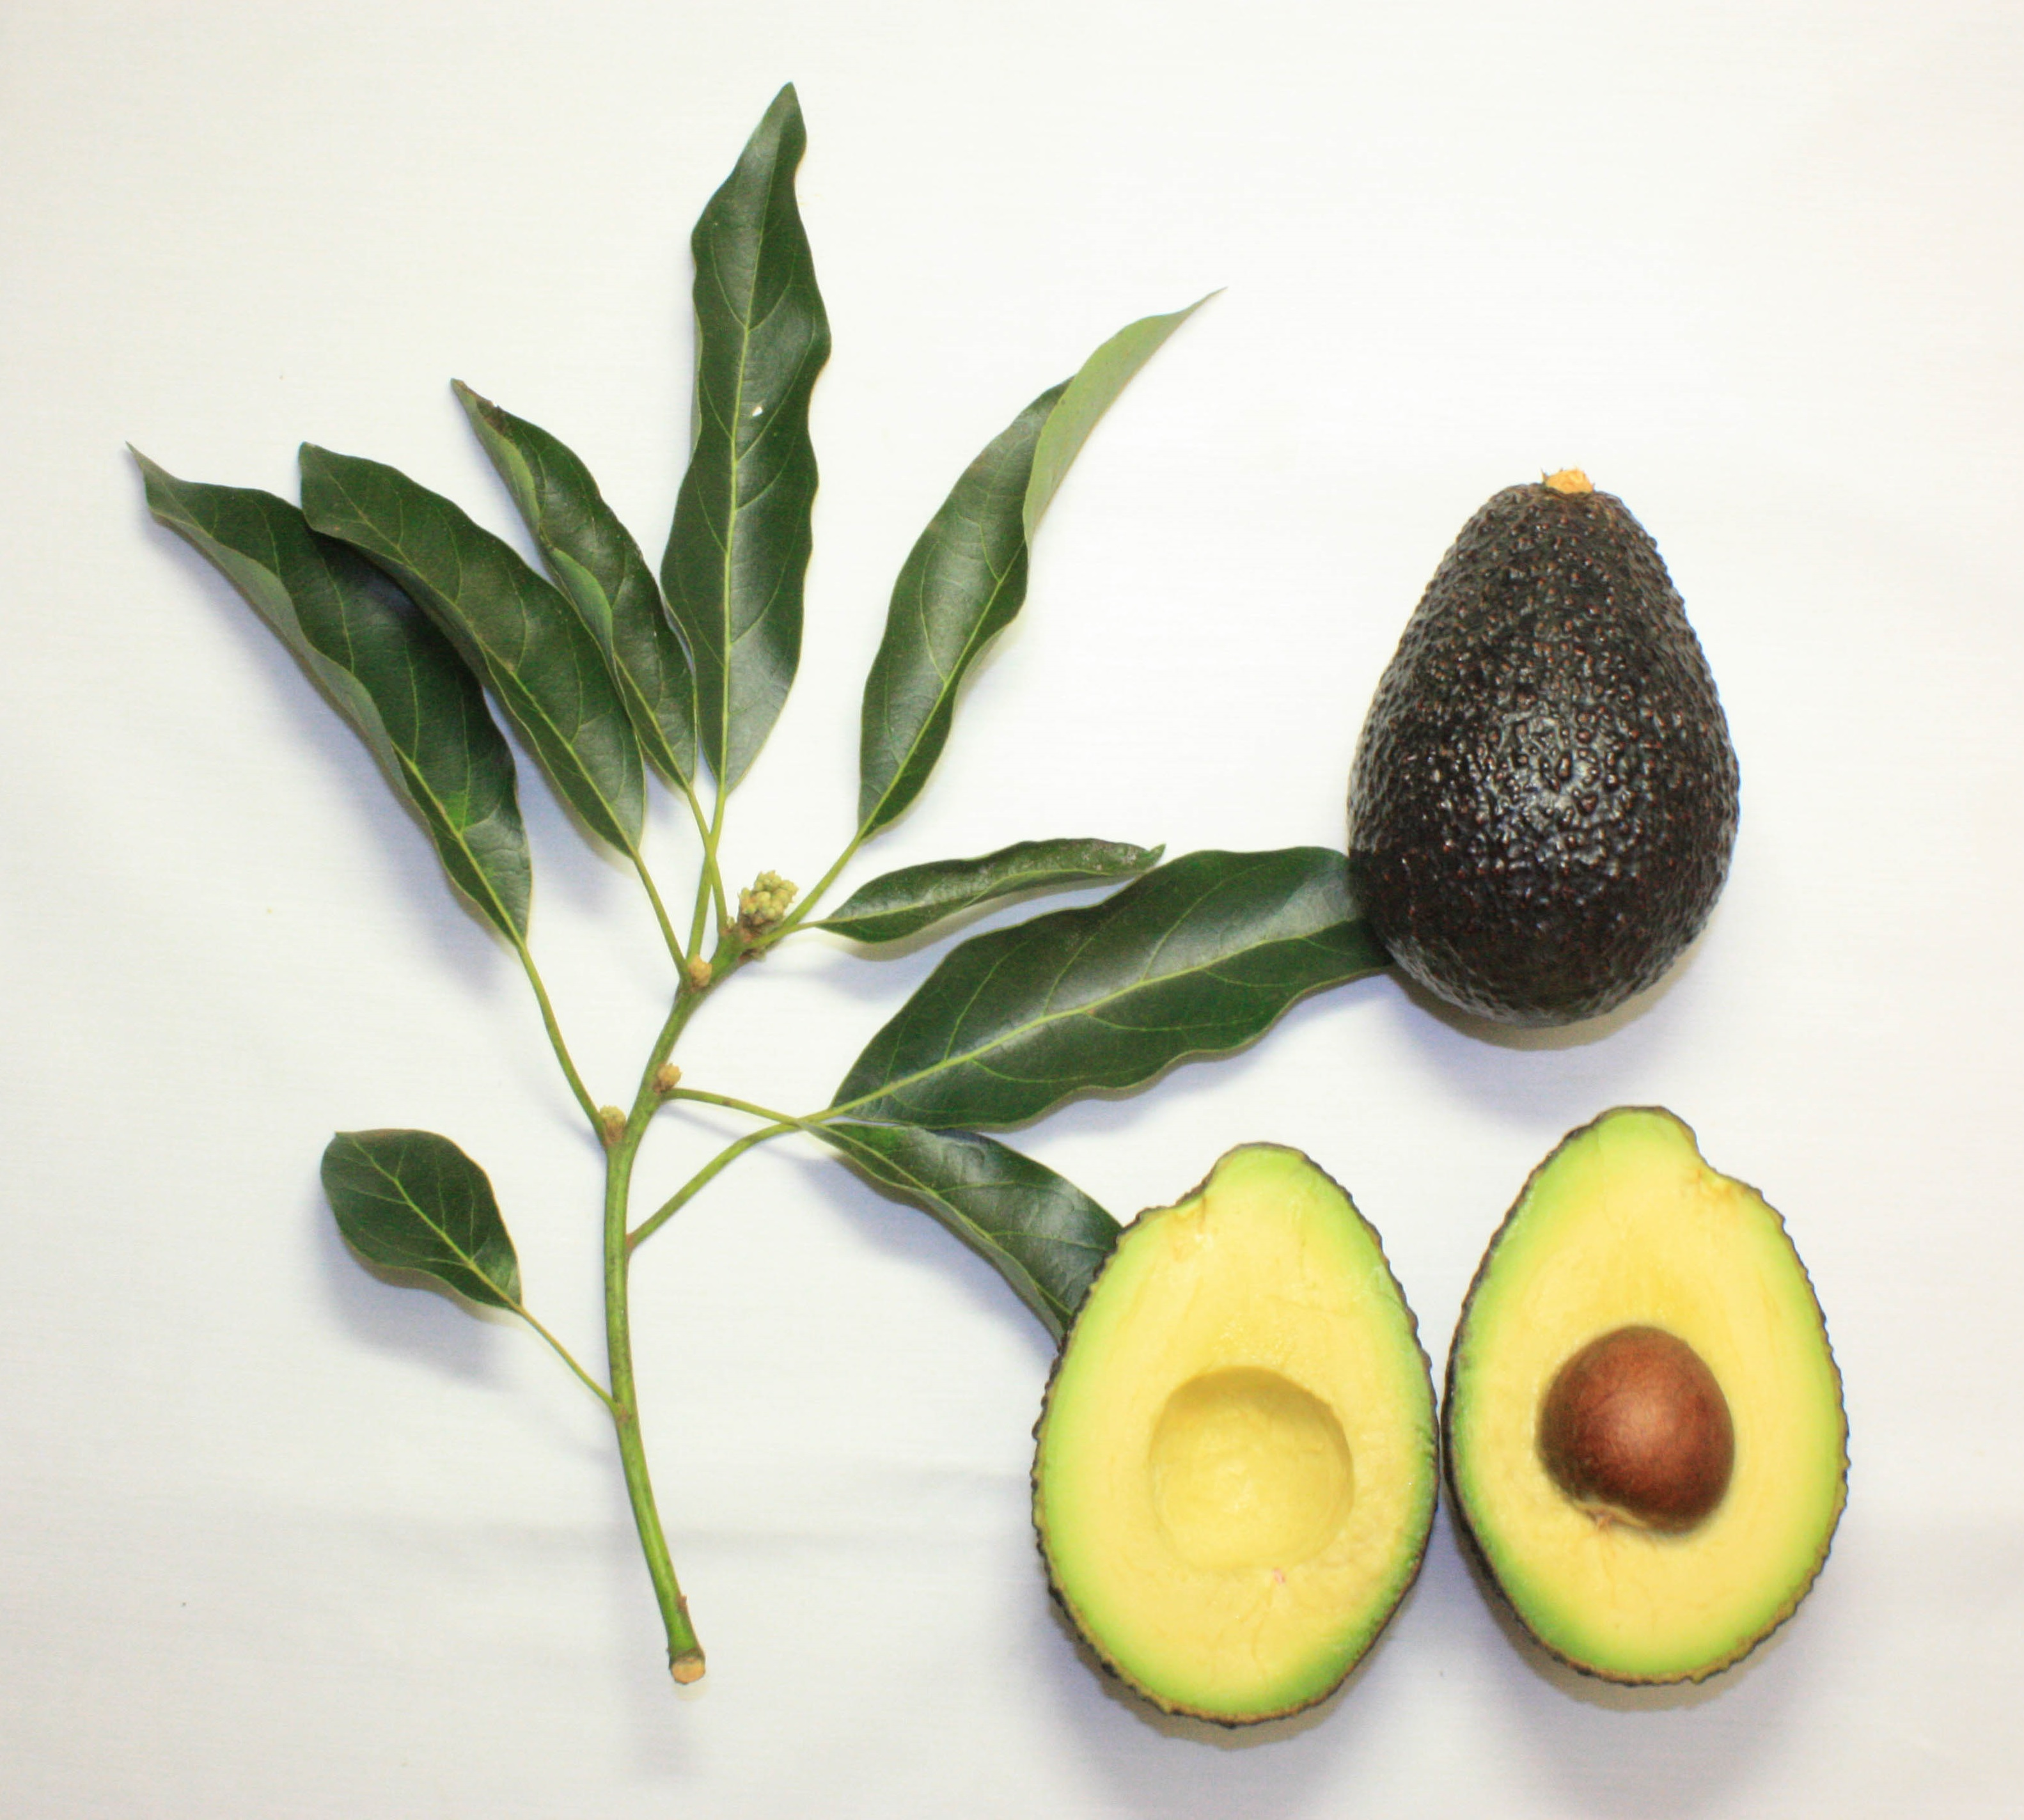 Maluma (avocado) - Wikipedia